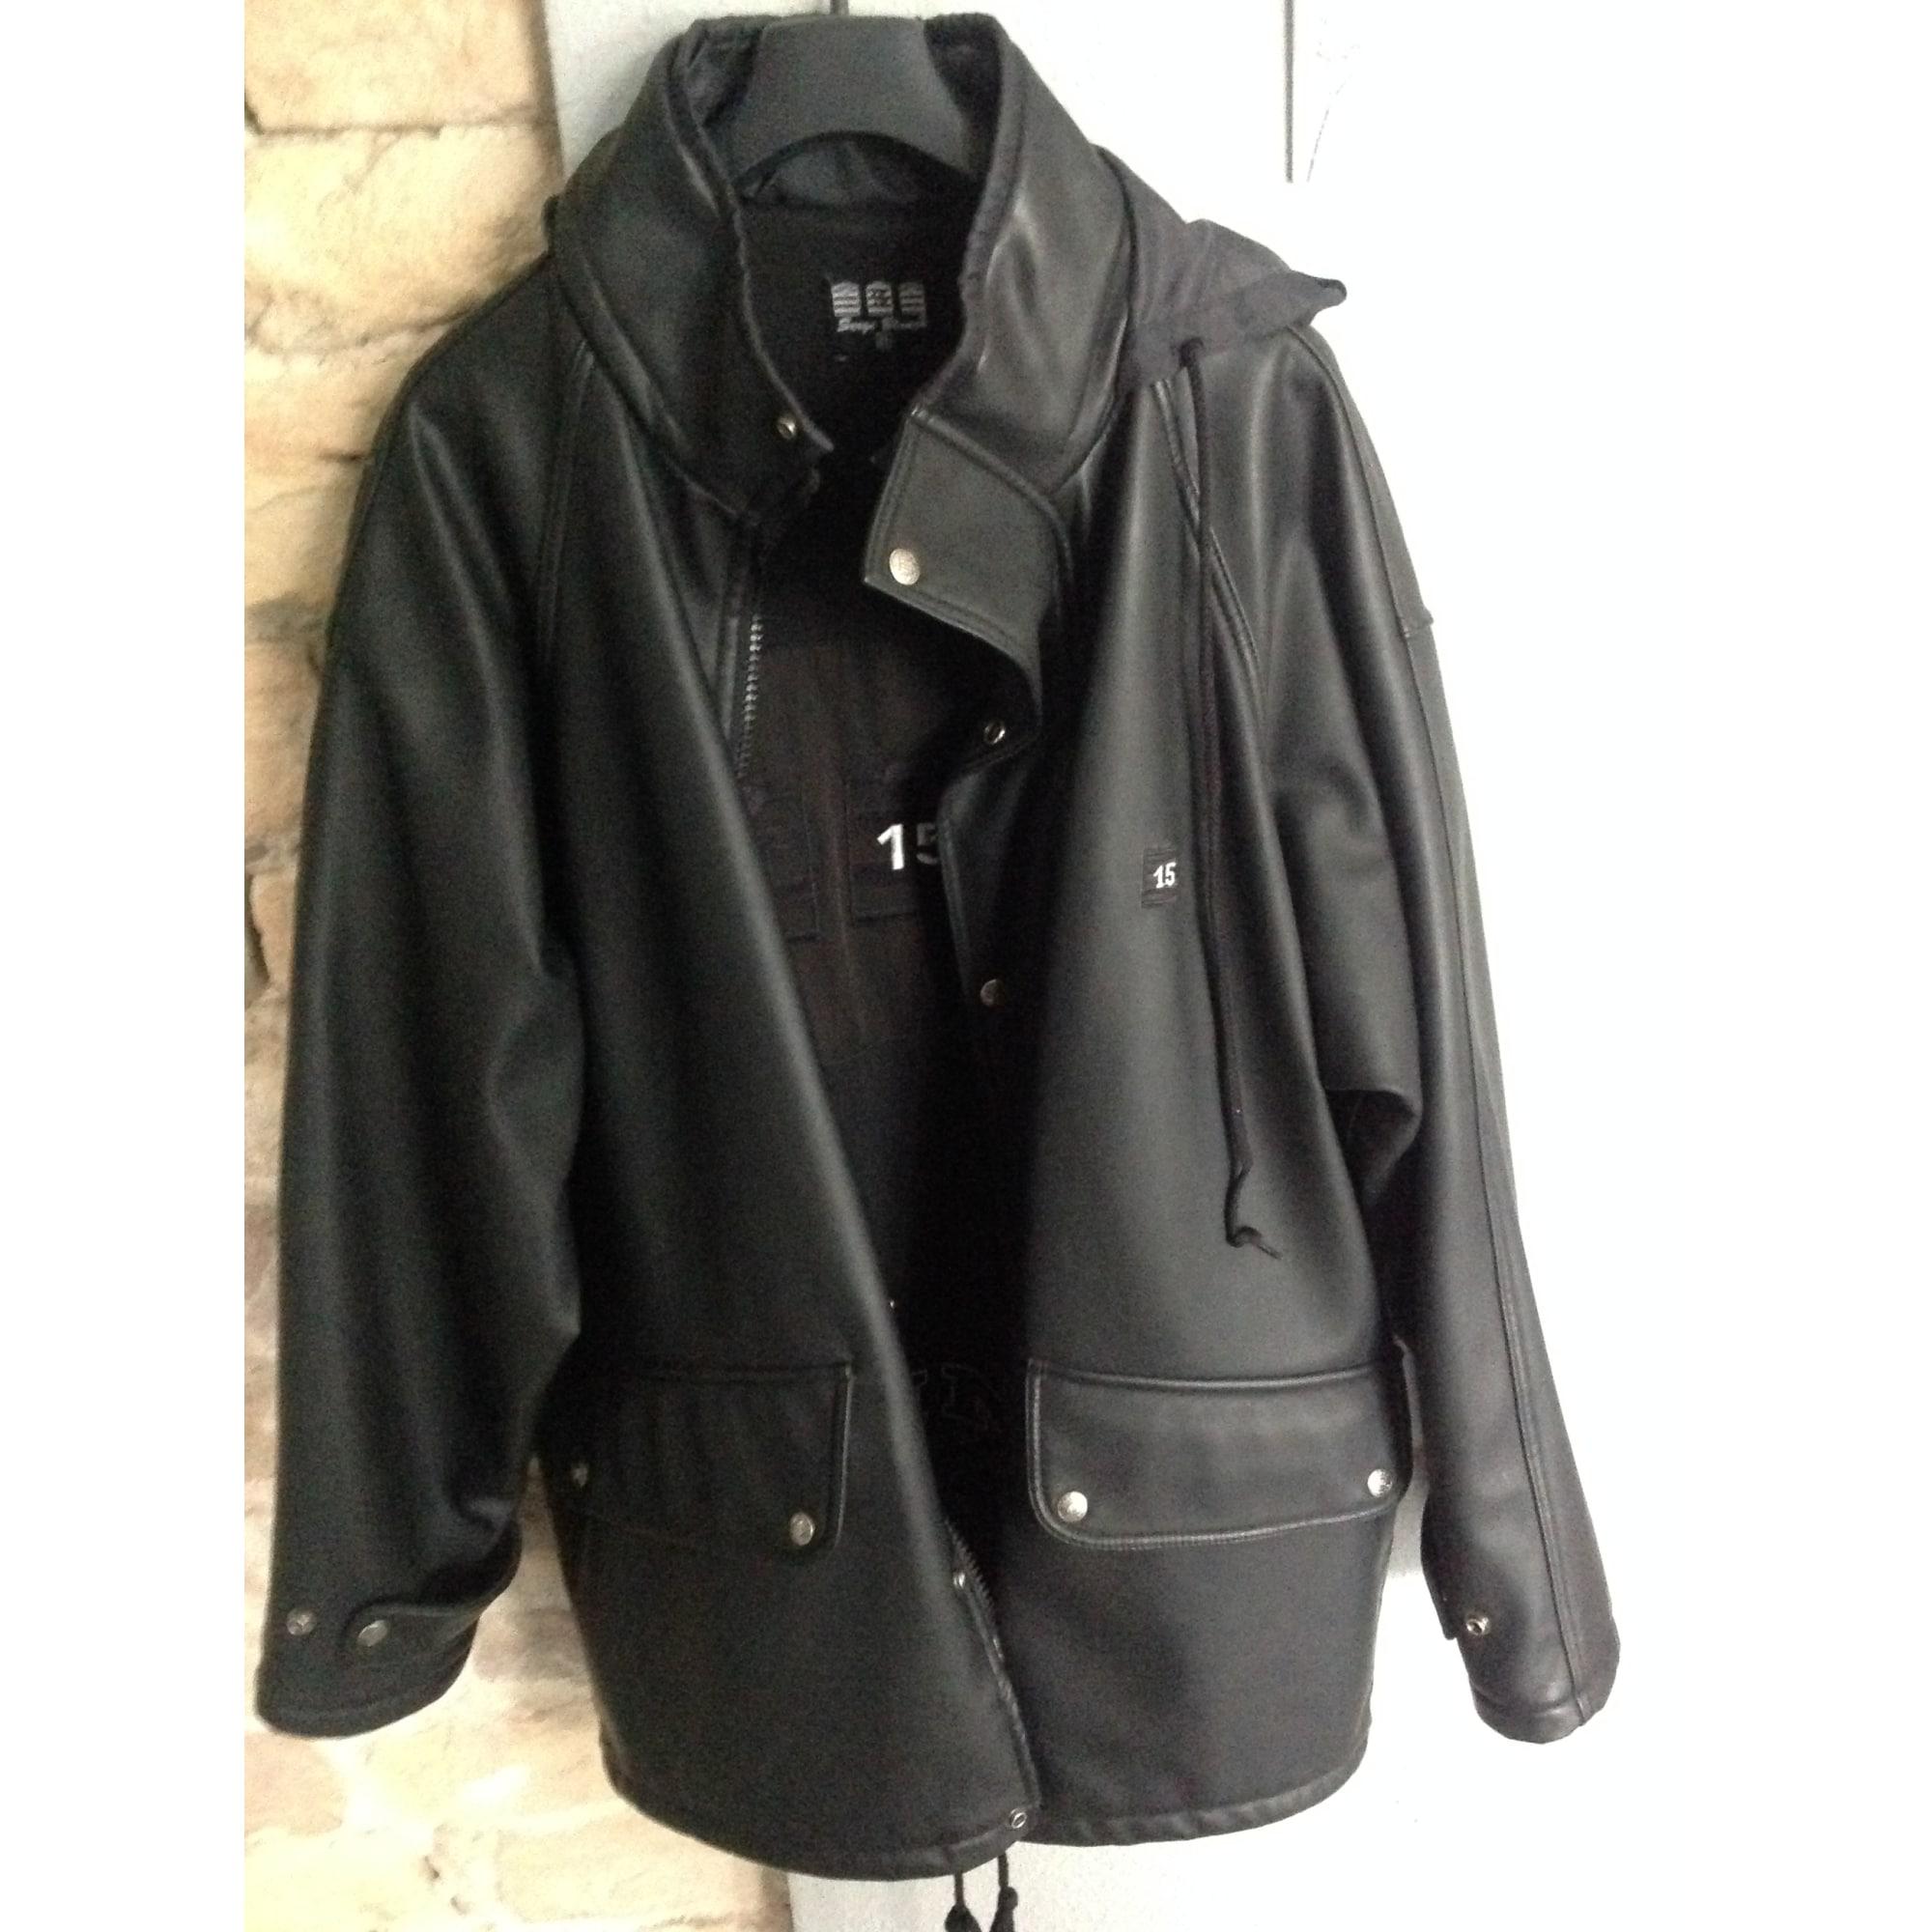 Parka SERGE BLANCO 58 (XL) noir vendu par Mathhuta 7201538